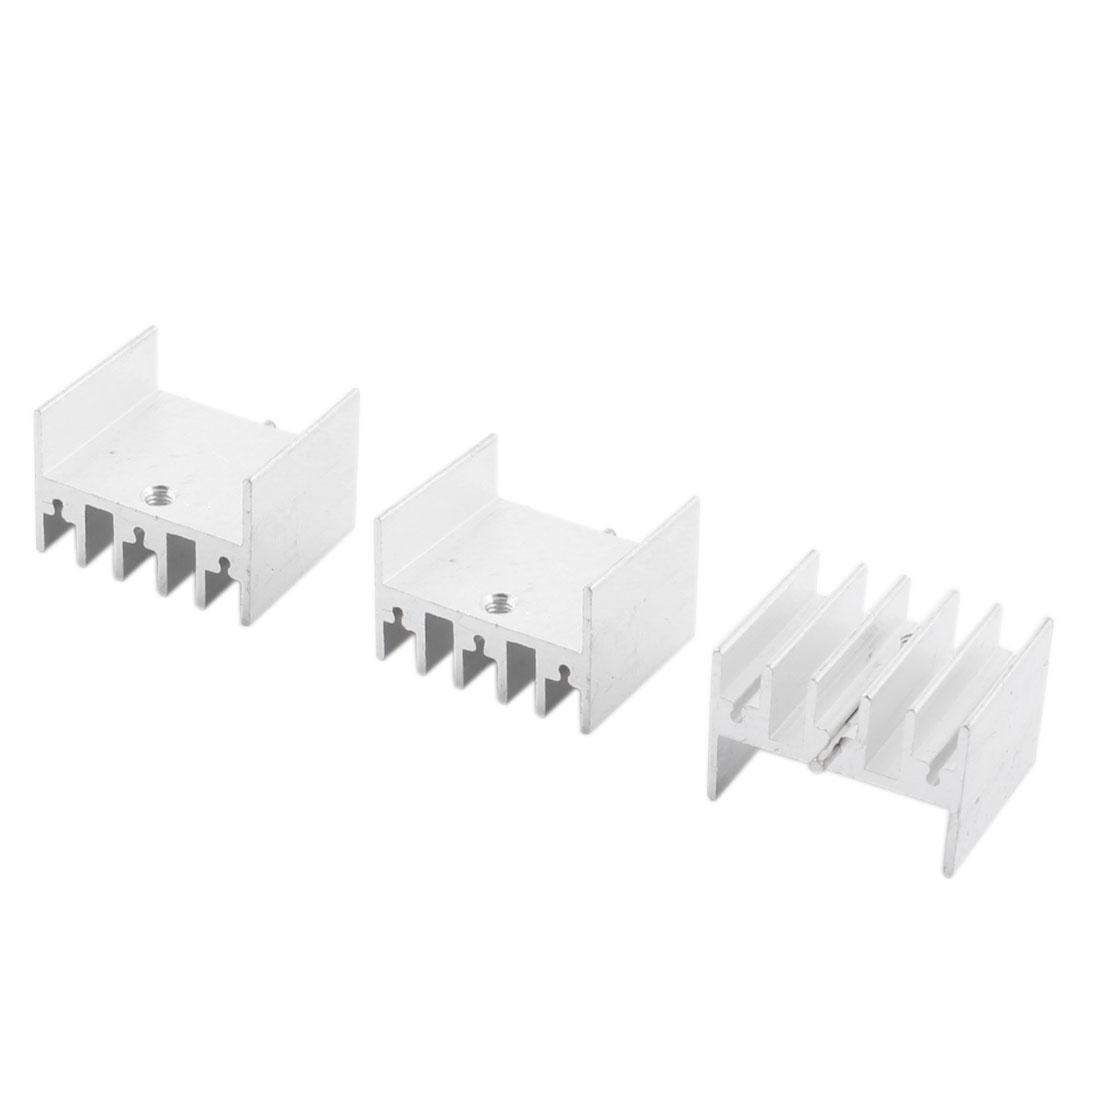 3pcs 23x16x20mm Aluminium Radiator Cooler Heatsink Heat Sink Cooling Fin + Needle for PCB Board